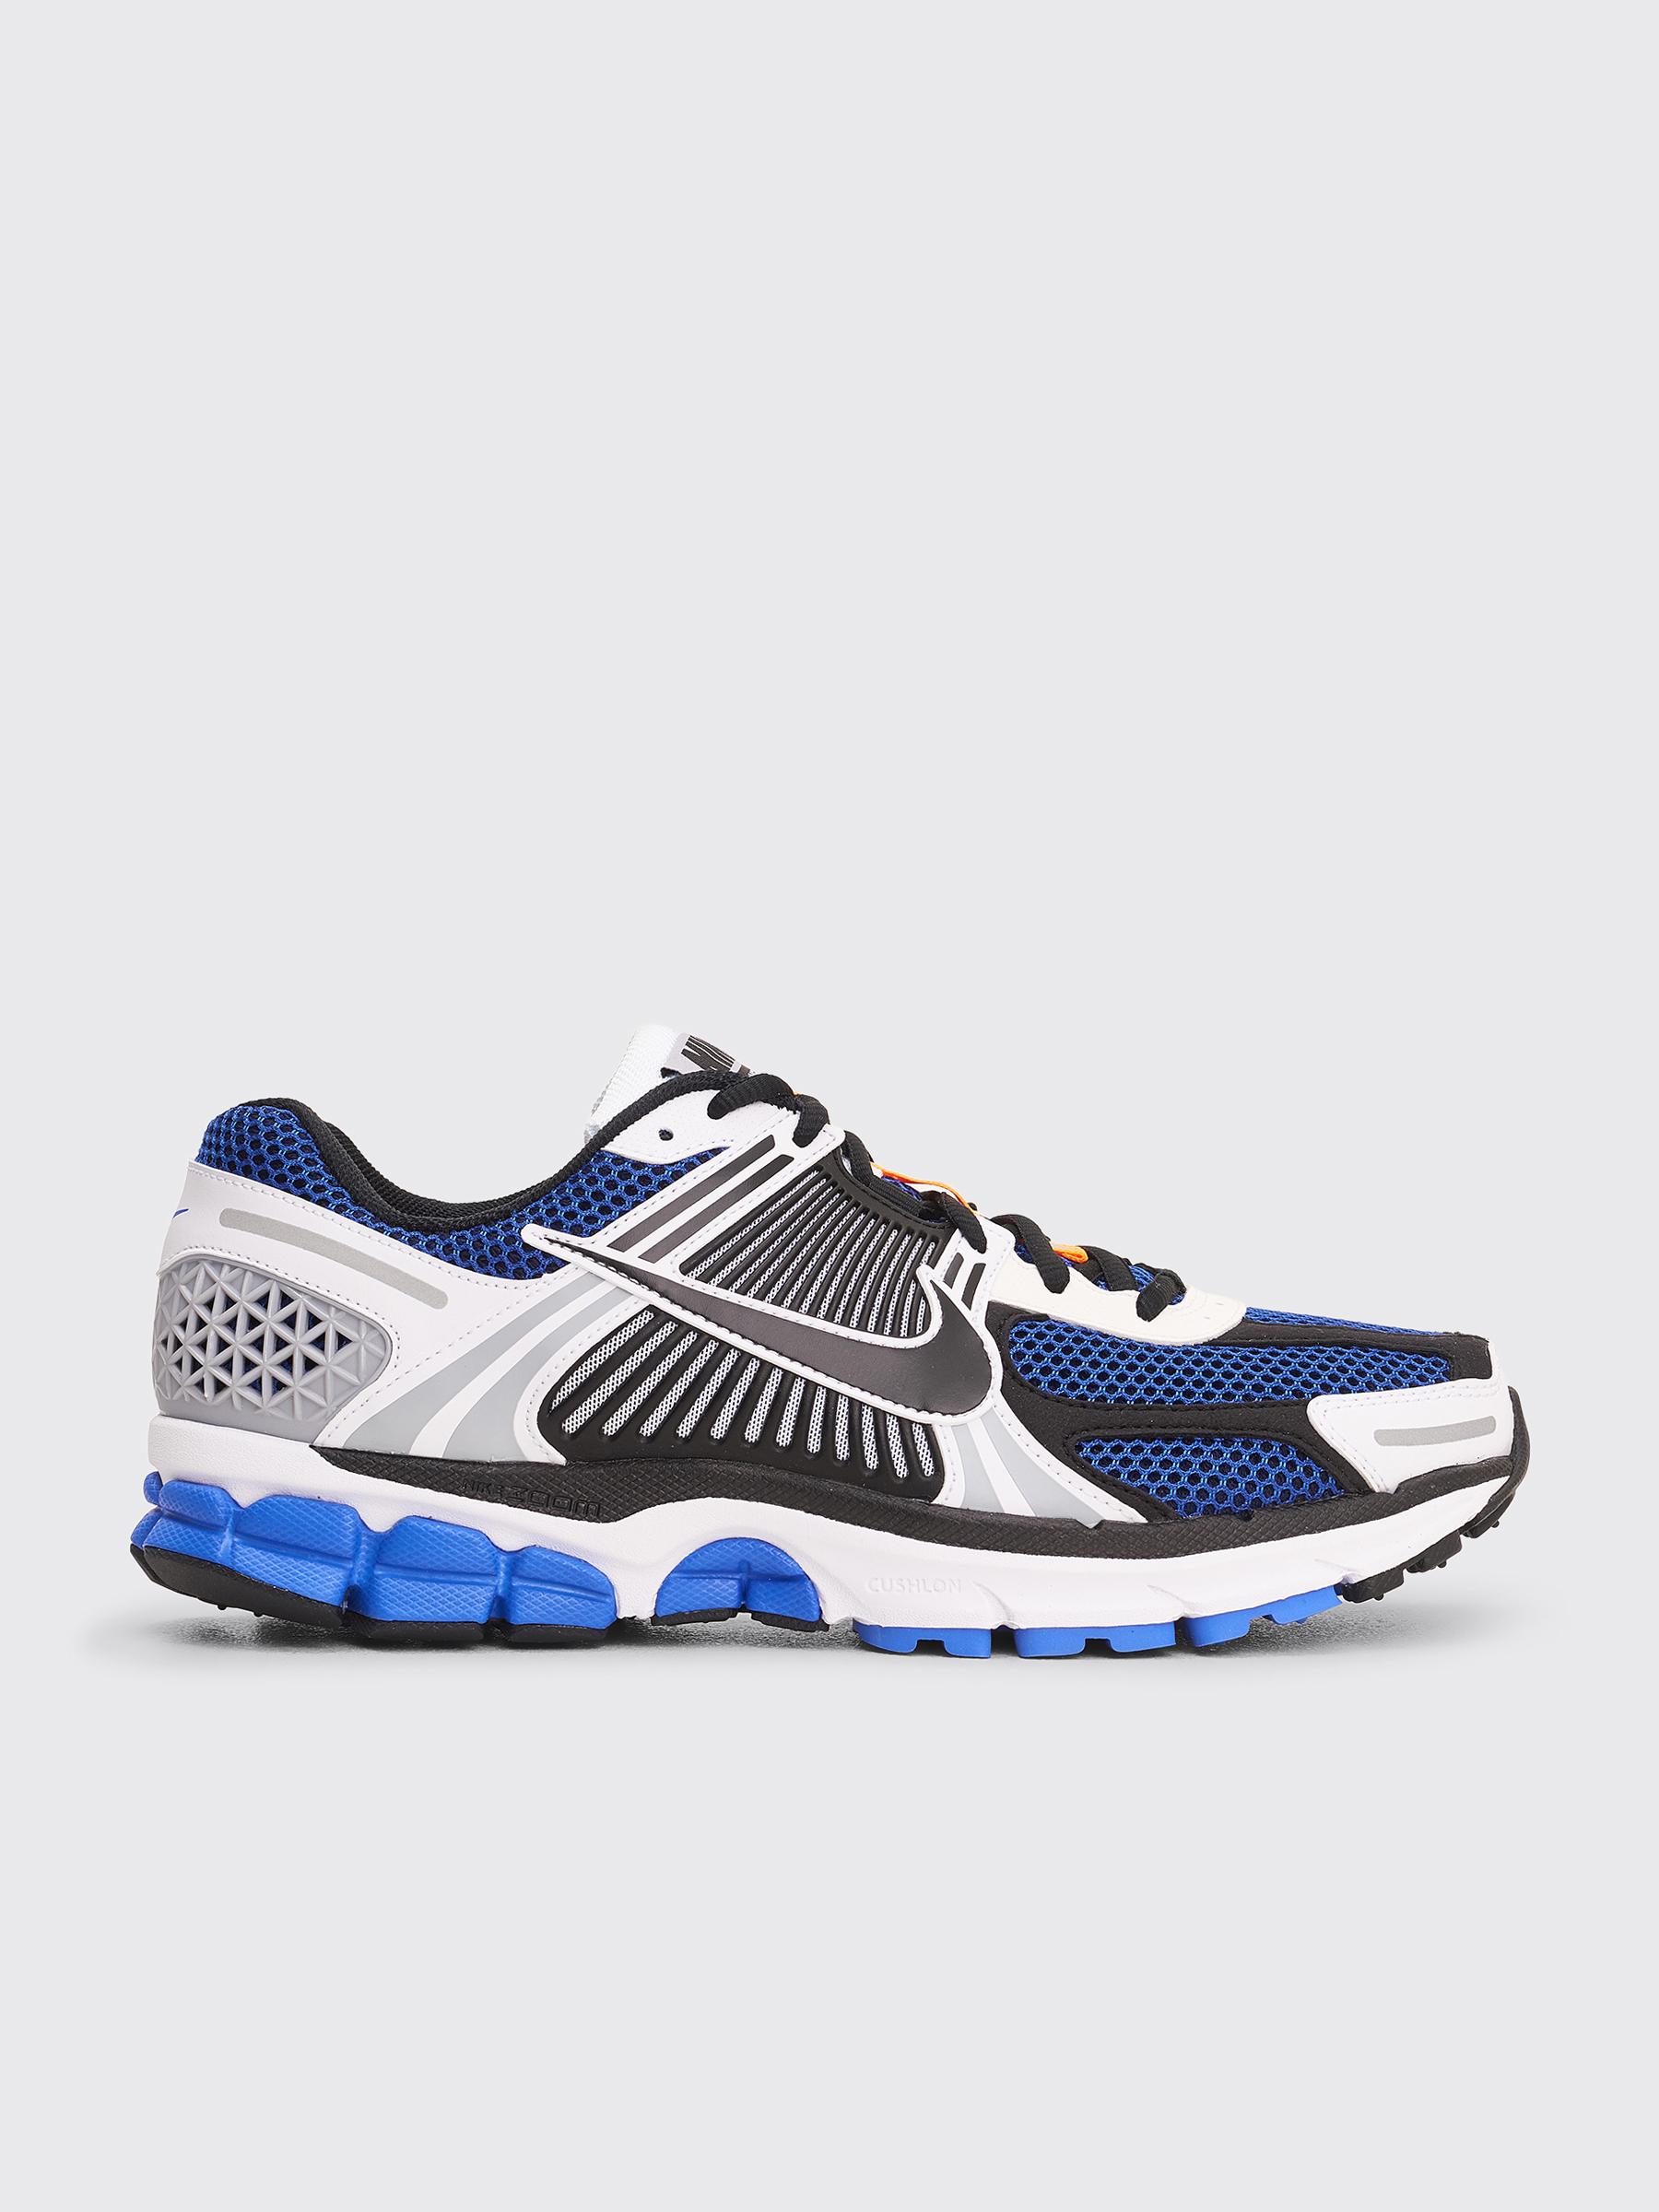 uk availability 89032 383ae Très Bien - Nike Zoom Vomero 5 SE SP White   Racer Blue